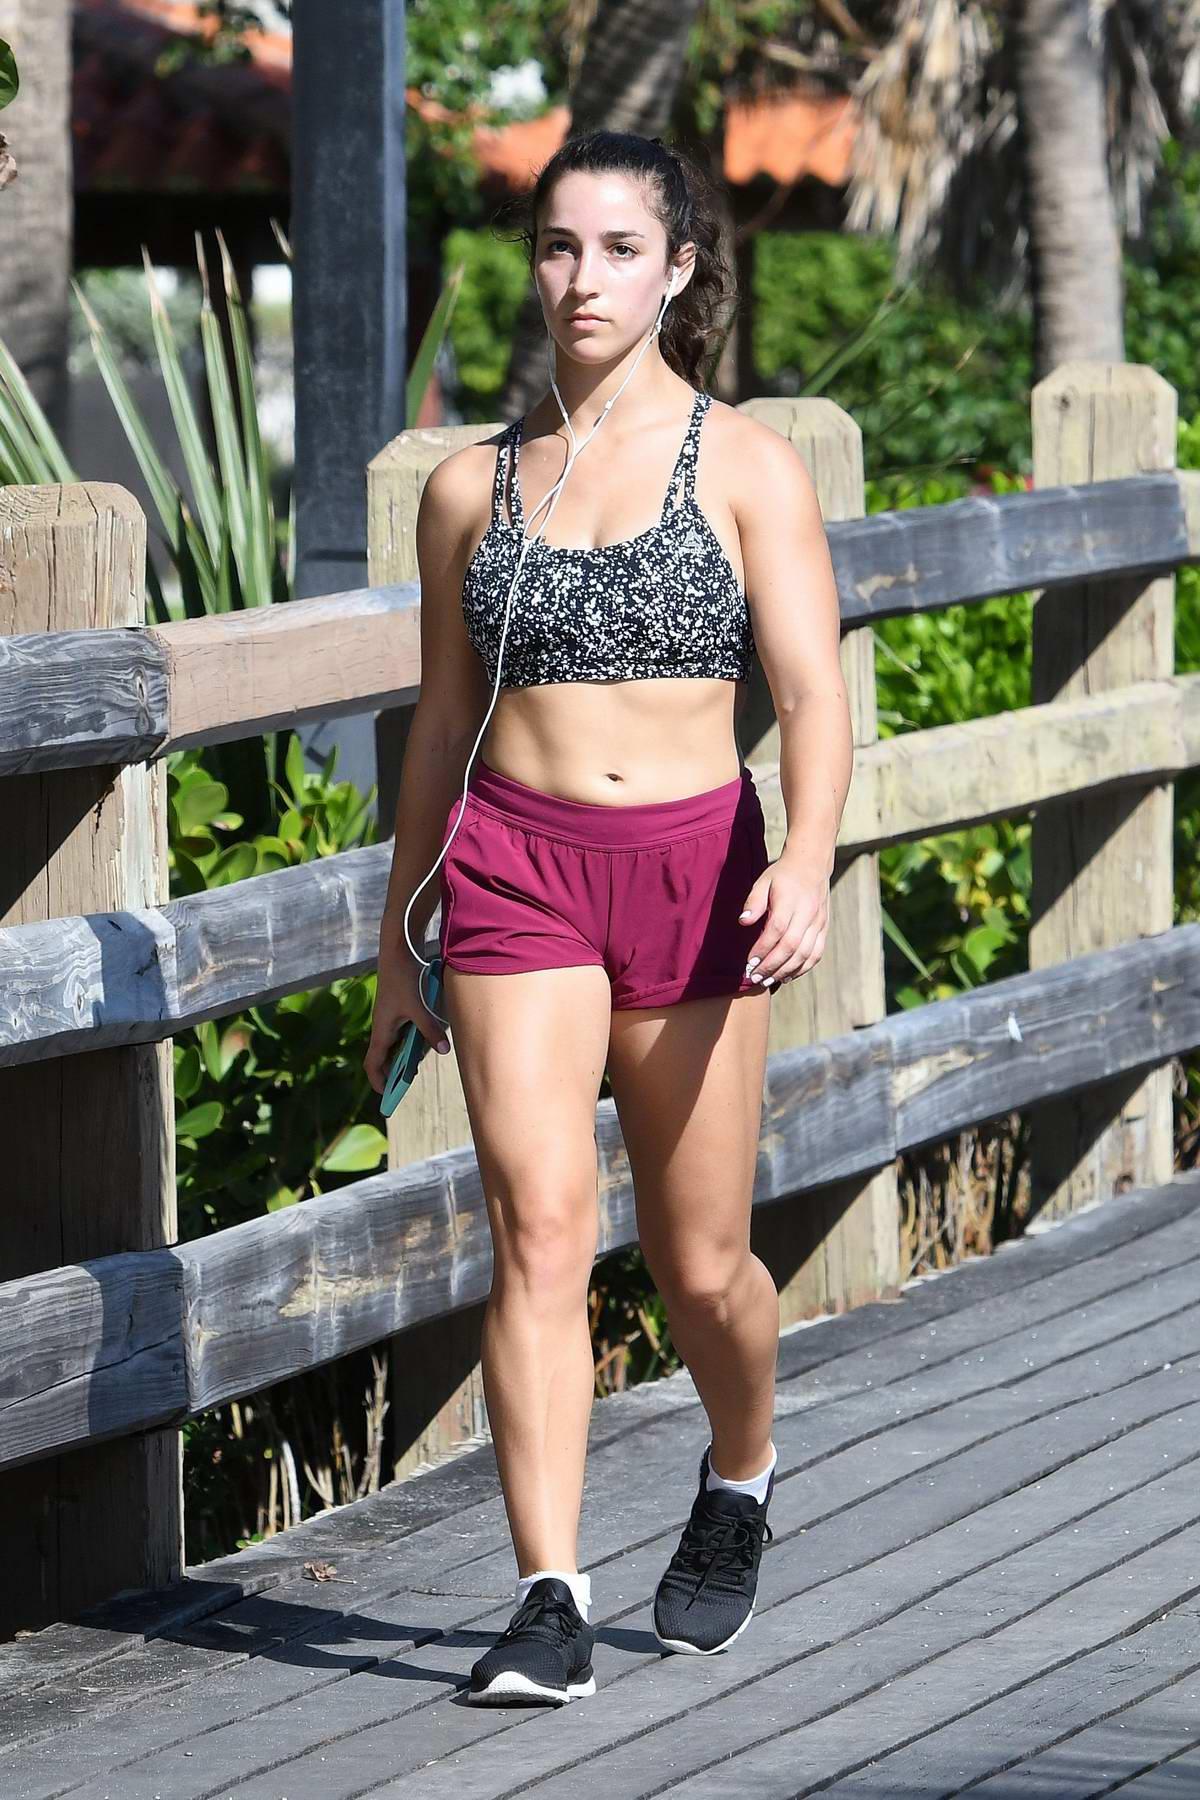 Aly Raisman out for walk in Miami beach, Florida